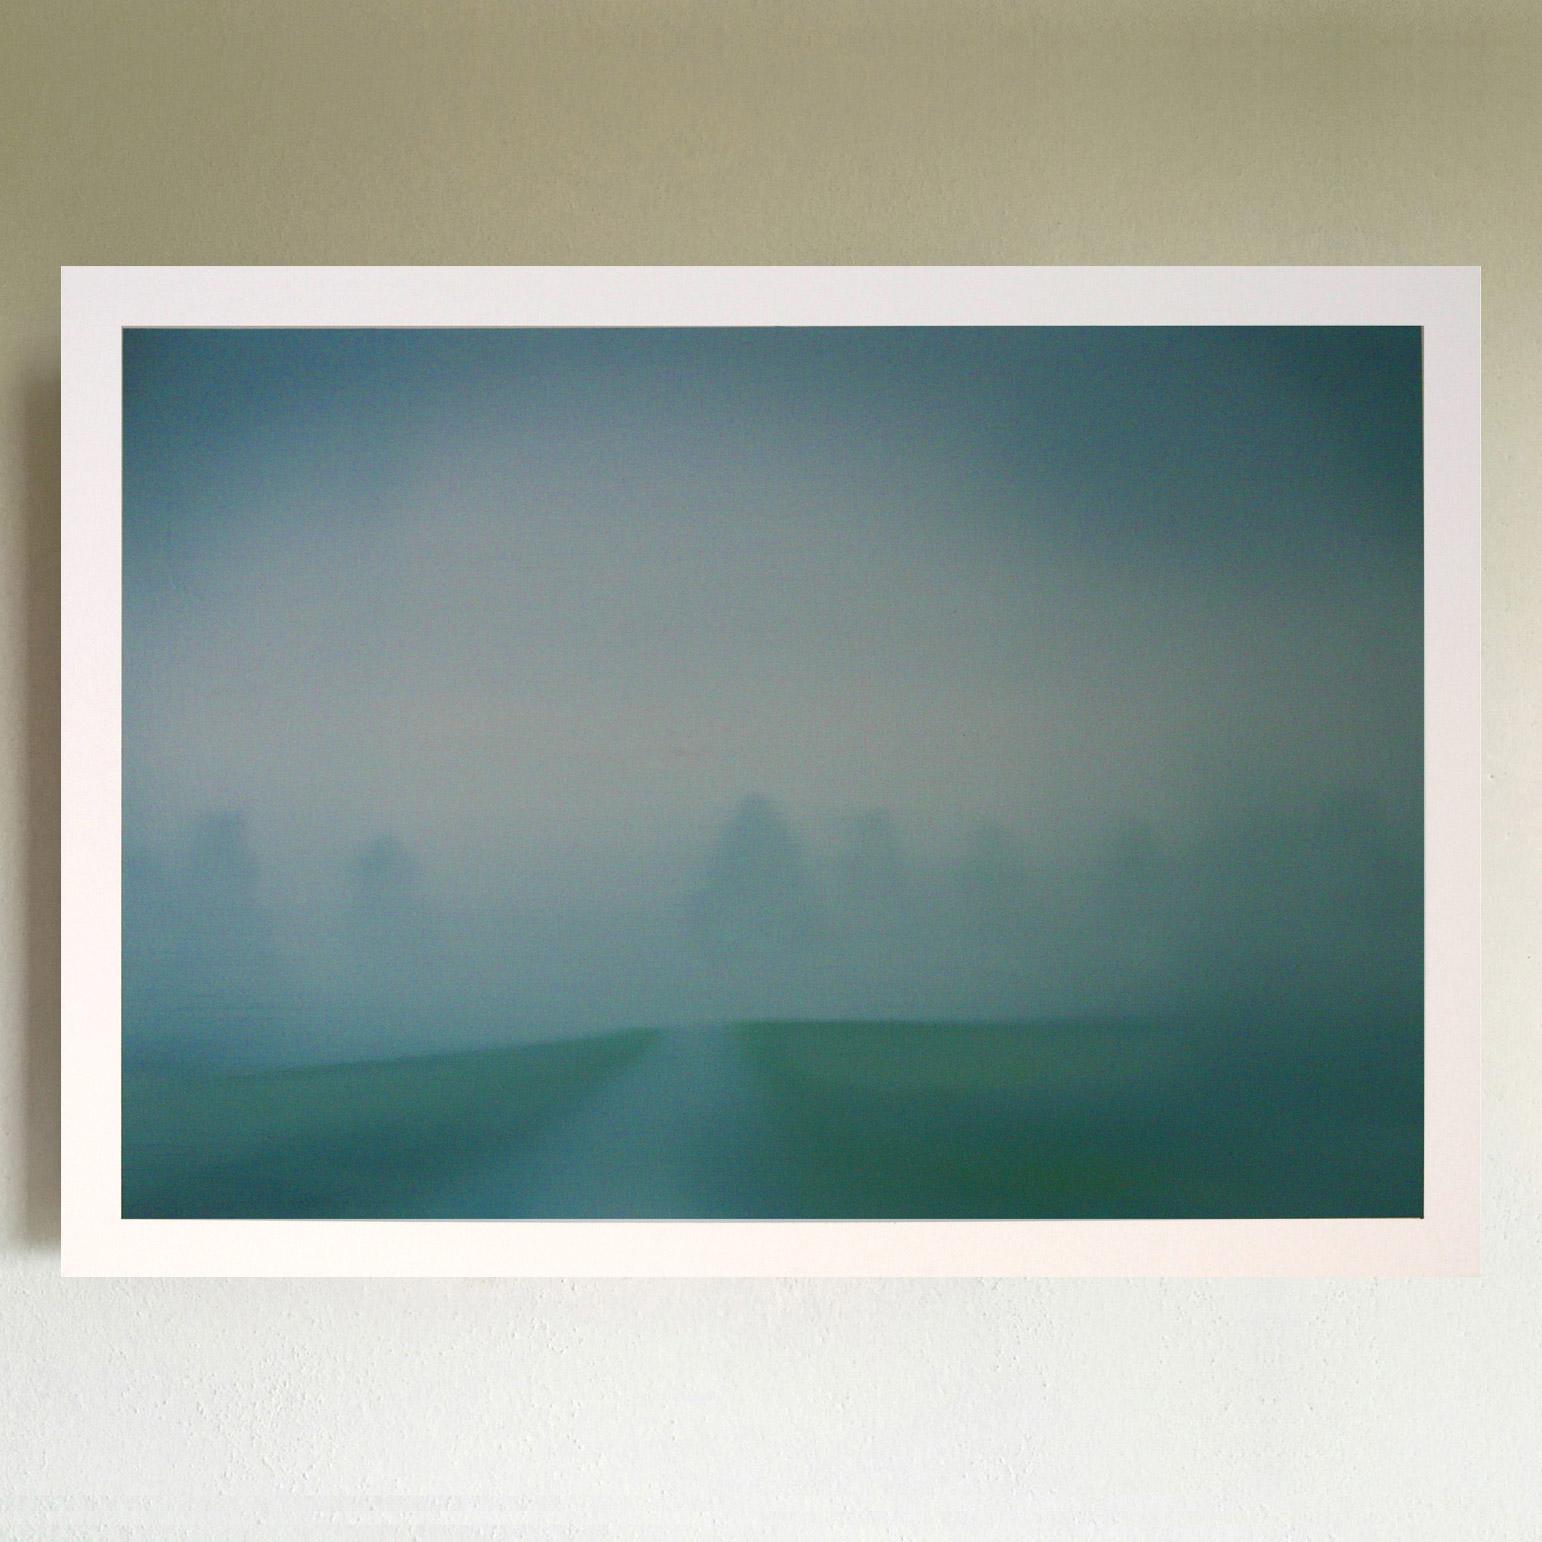 T#50-2009, oil on canvas 50x70cm, priv. coll.